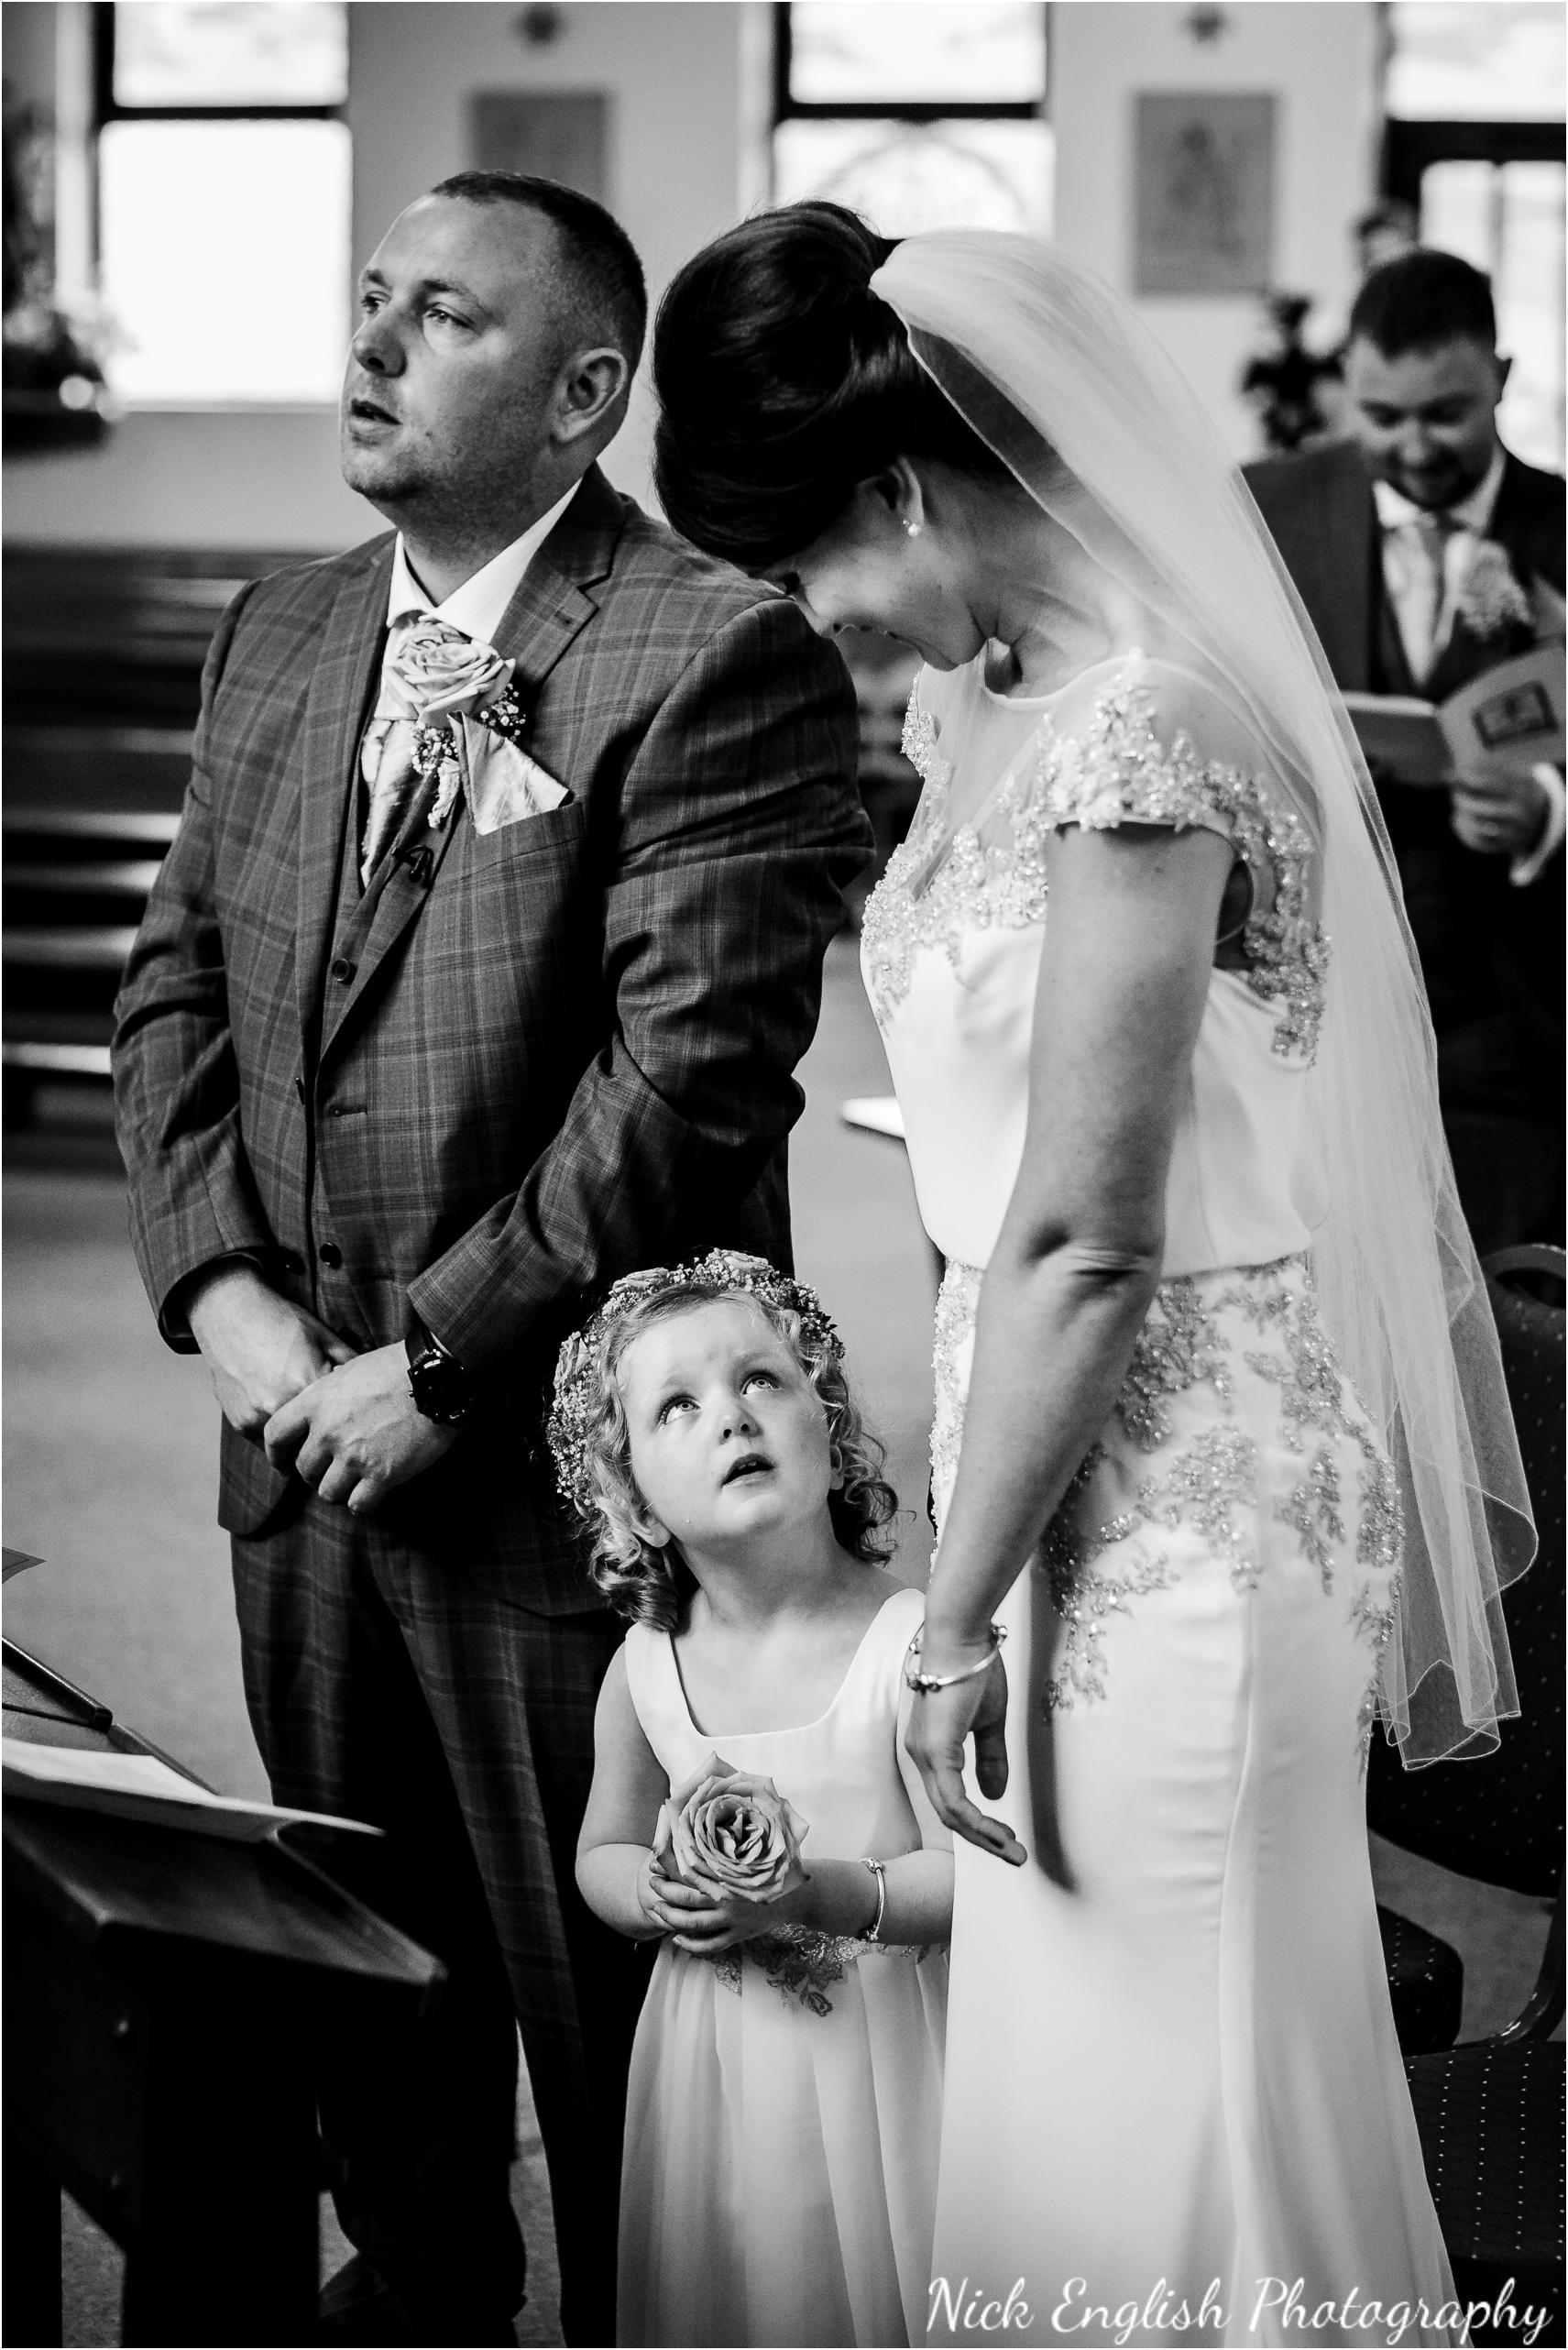 Stacey-Ash-Wedding-Photographs-Stanley-House-Preston-Lancashire-47.jpg